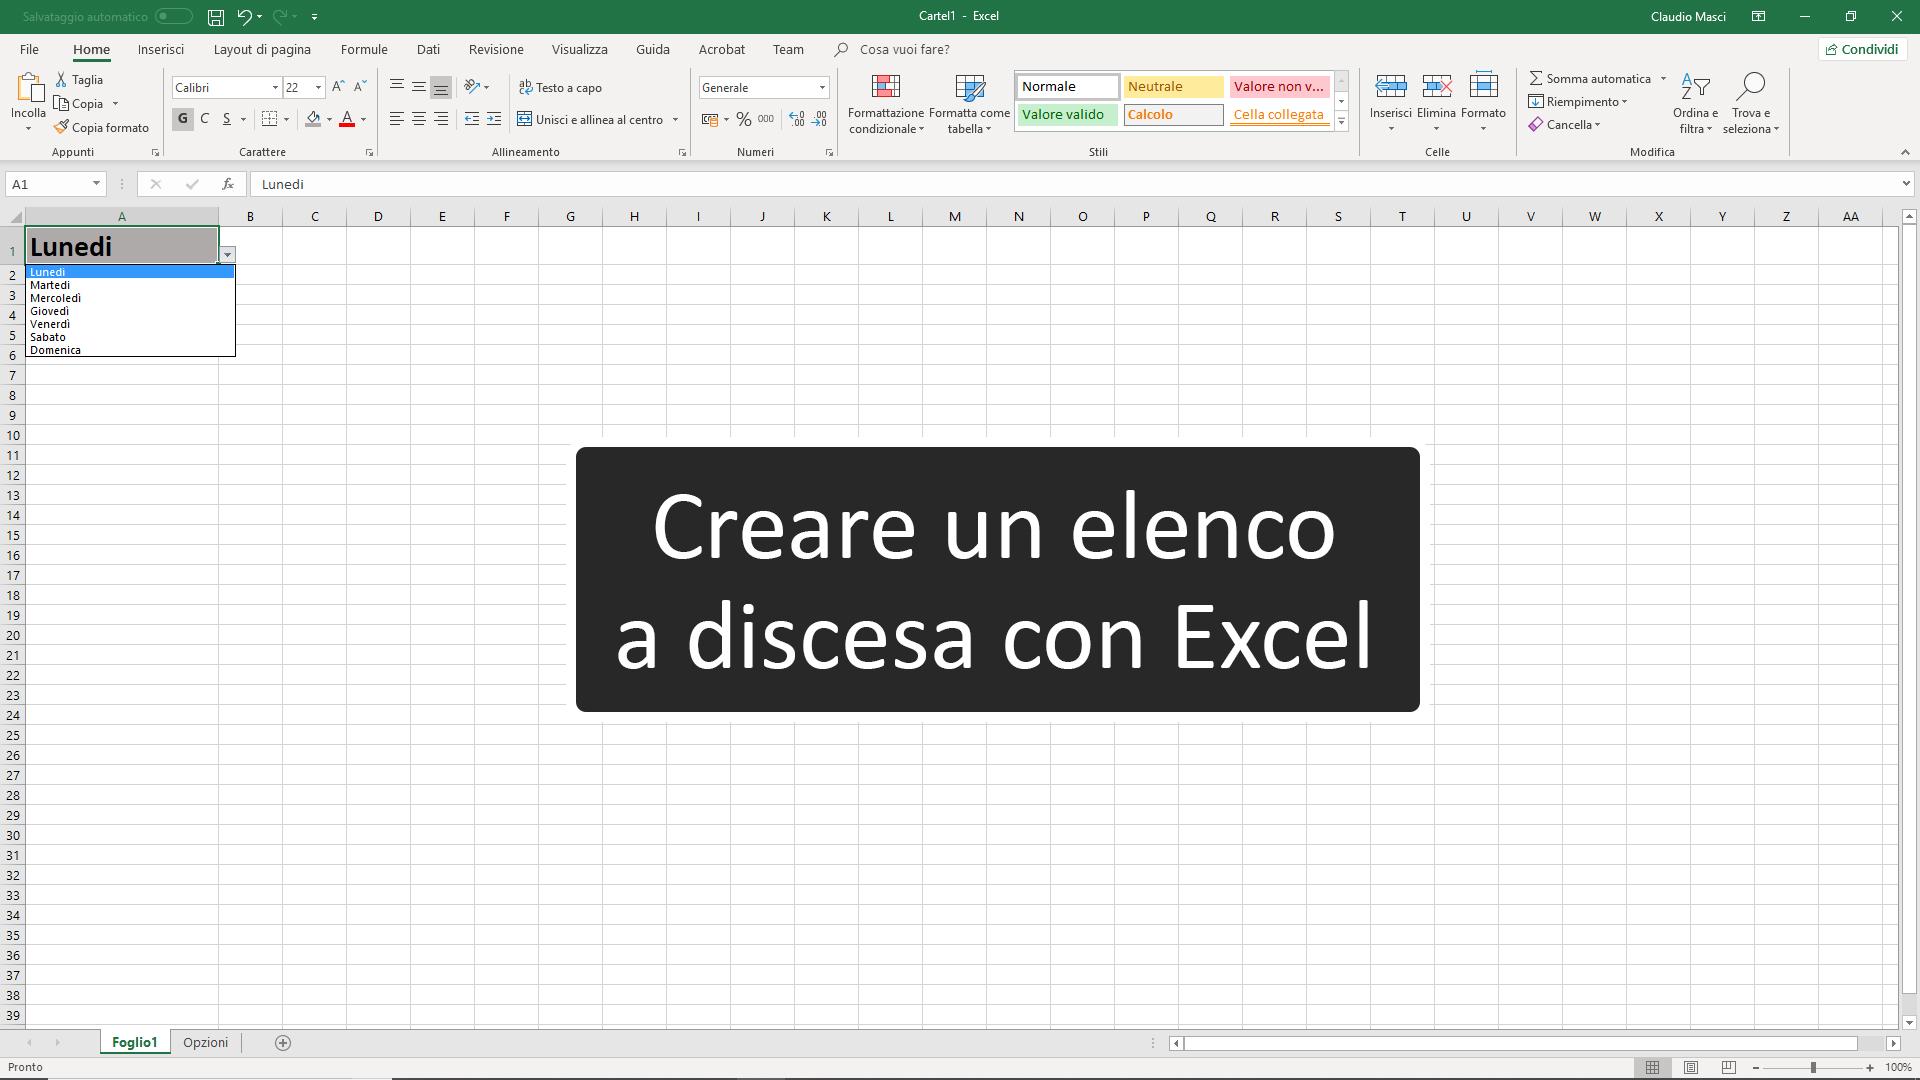 Come creare un elenco a discesa con Excel